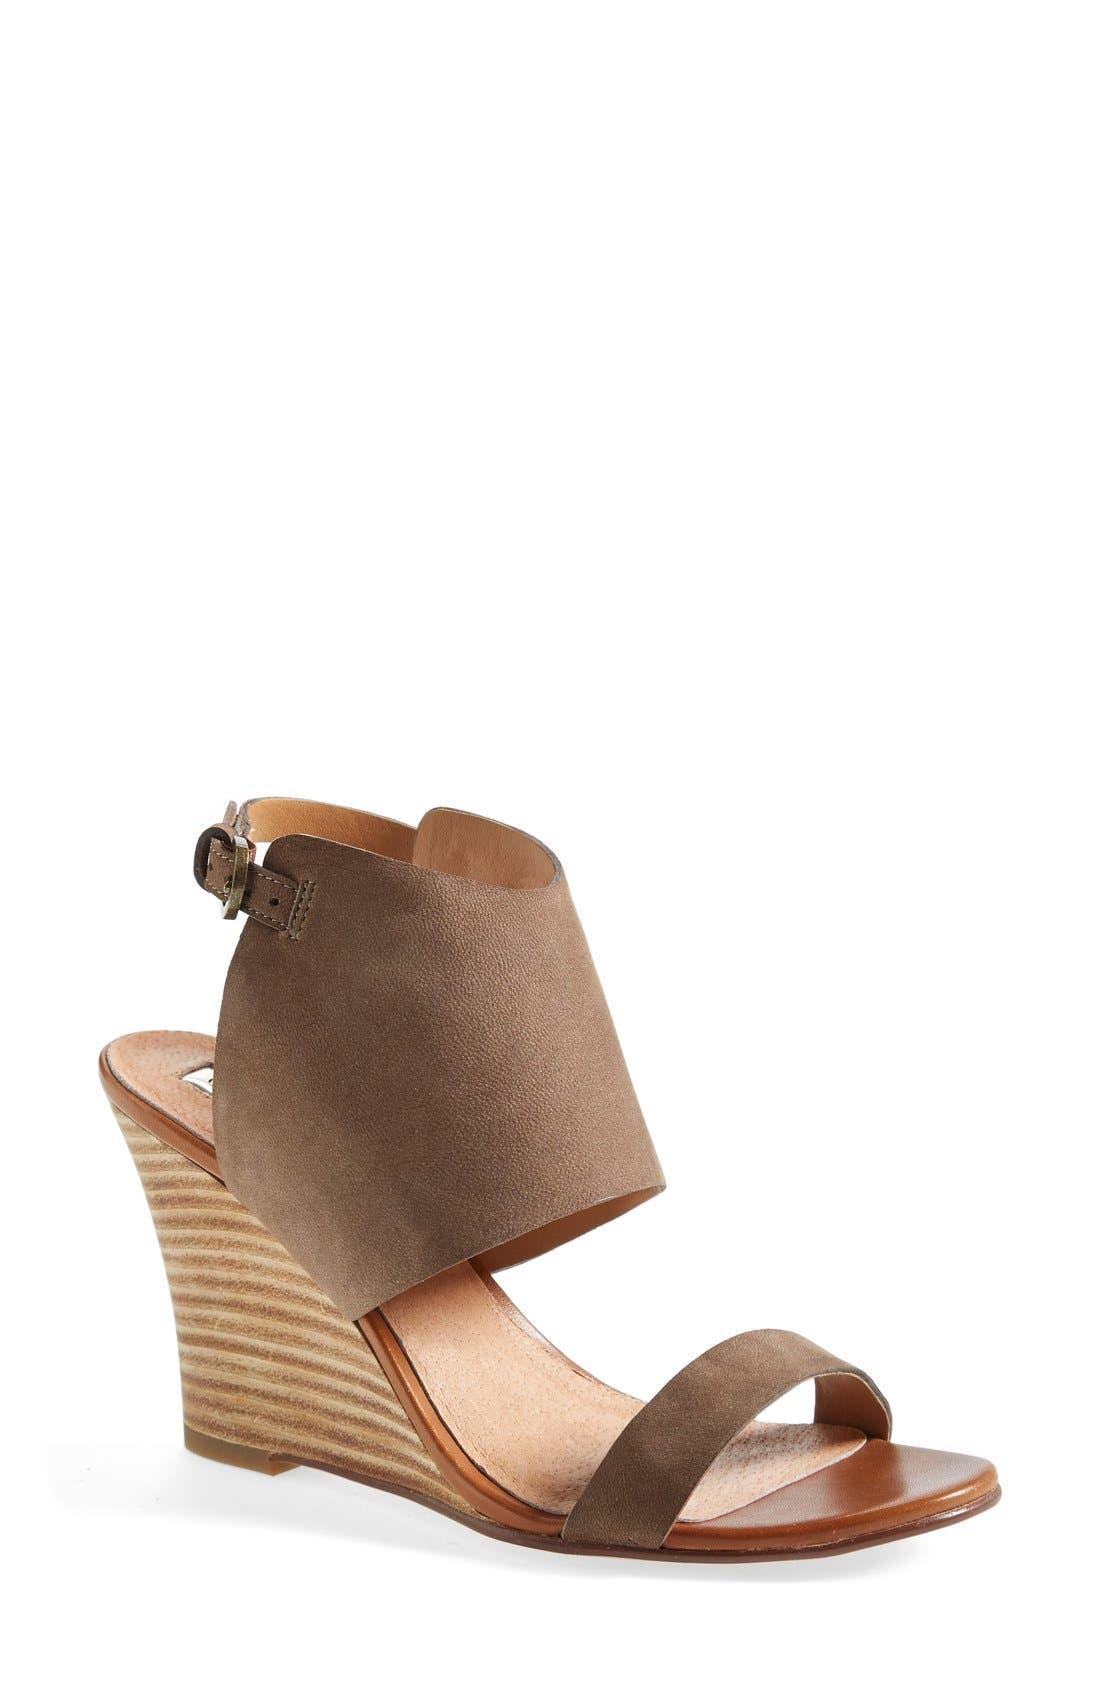 HALOGEN<SUP>®</SUP> 'Clarette' Wedge Sandal, Main, color, 030